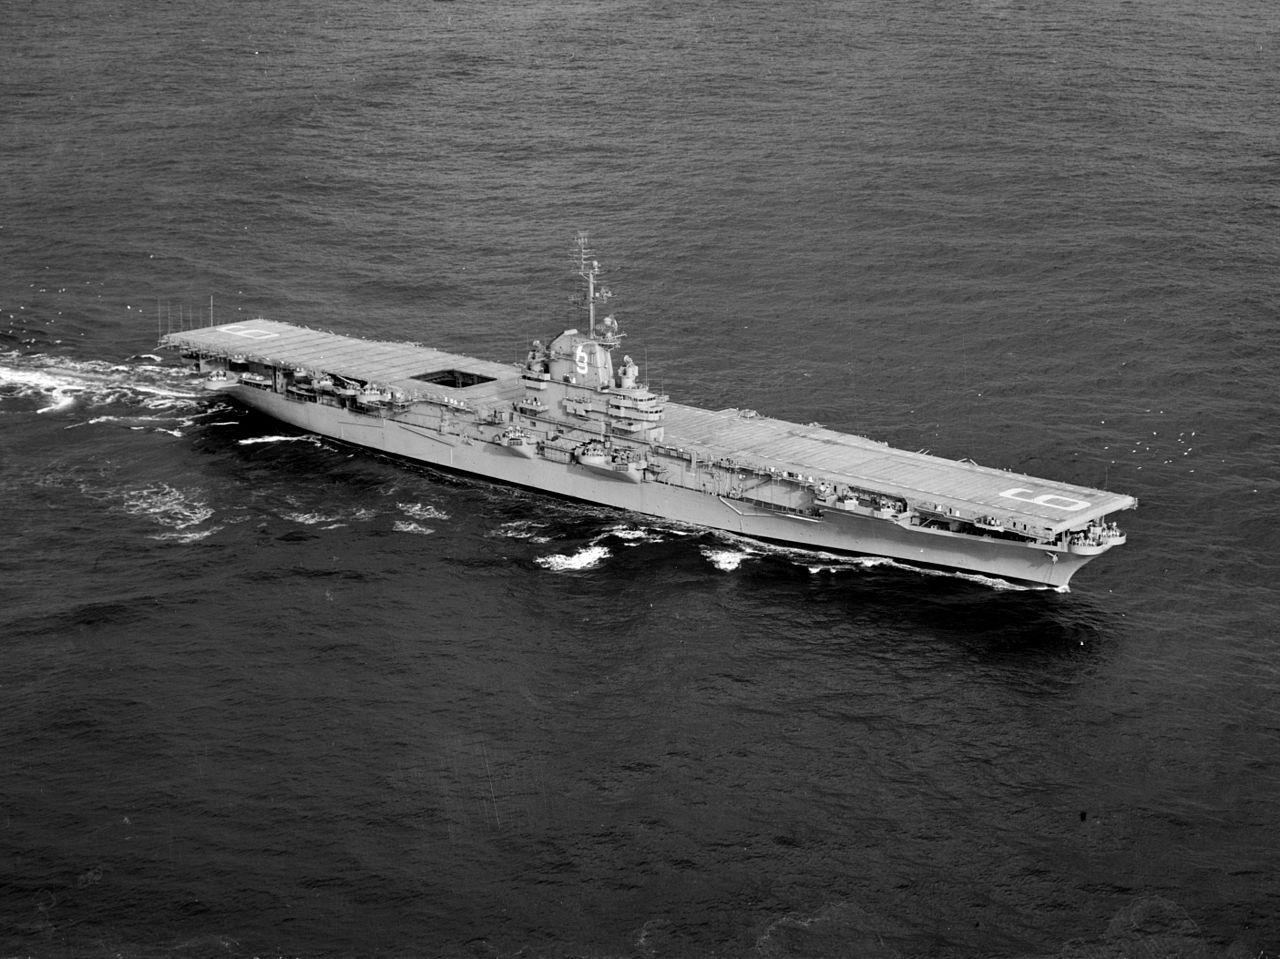 Warship - USS Essex (CV-9) - Carrier